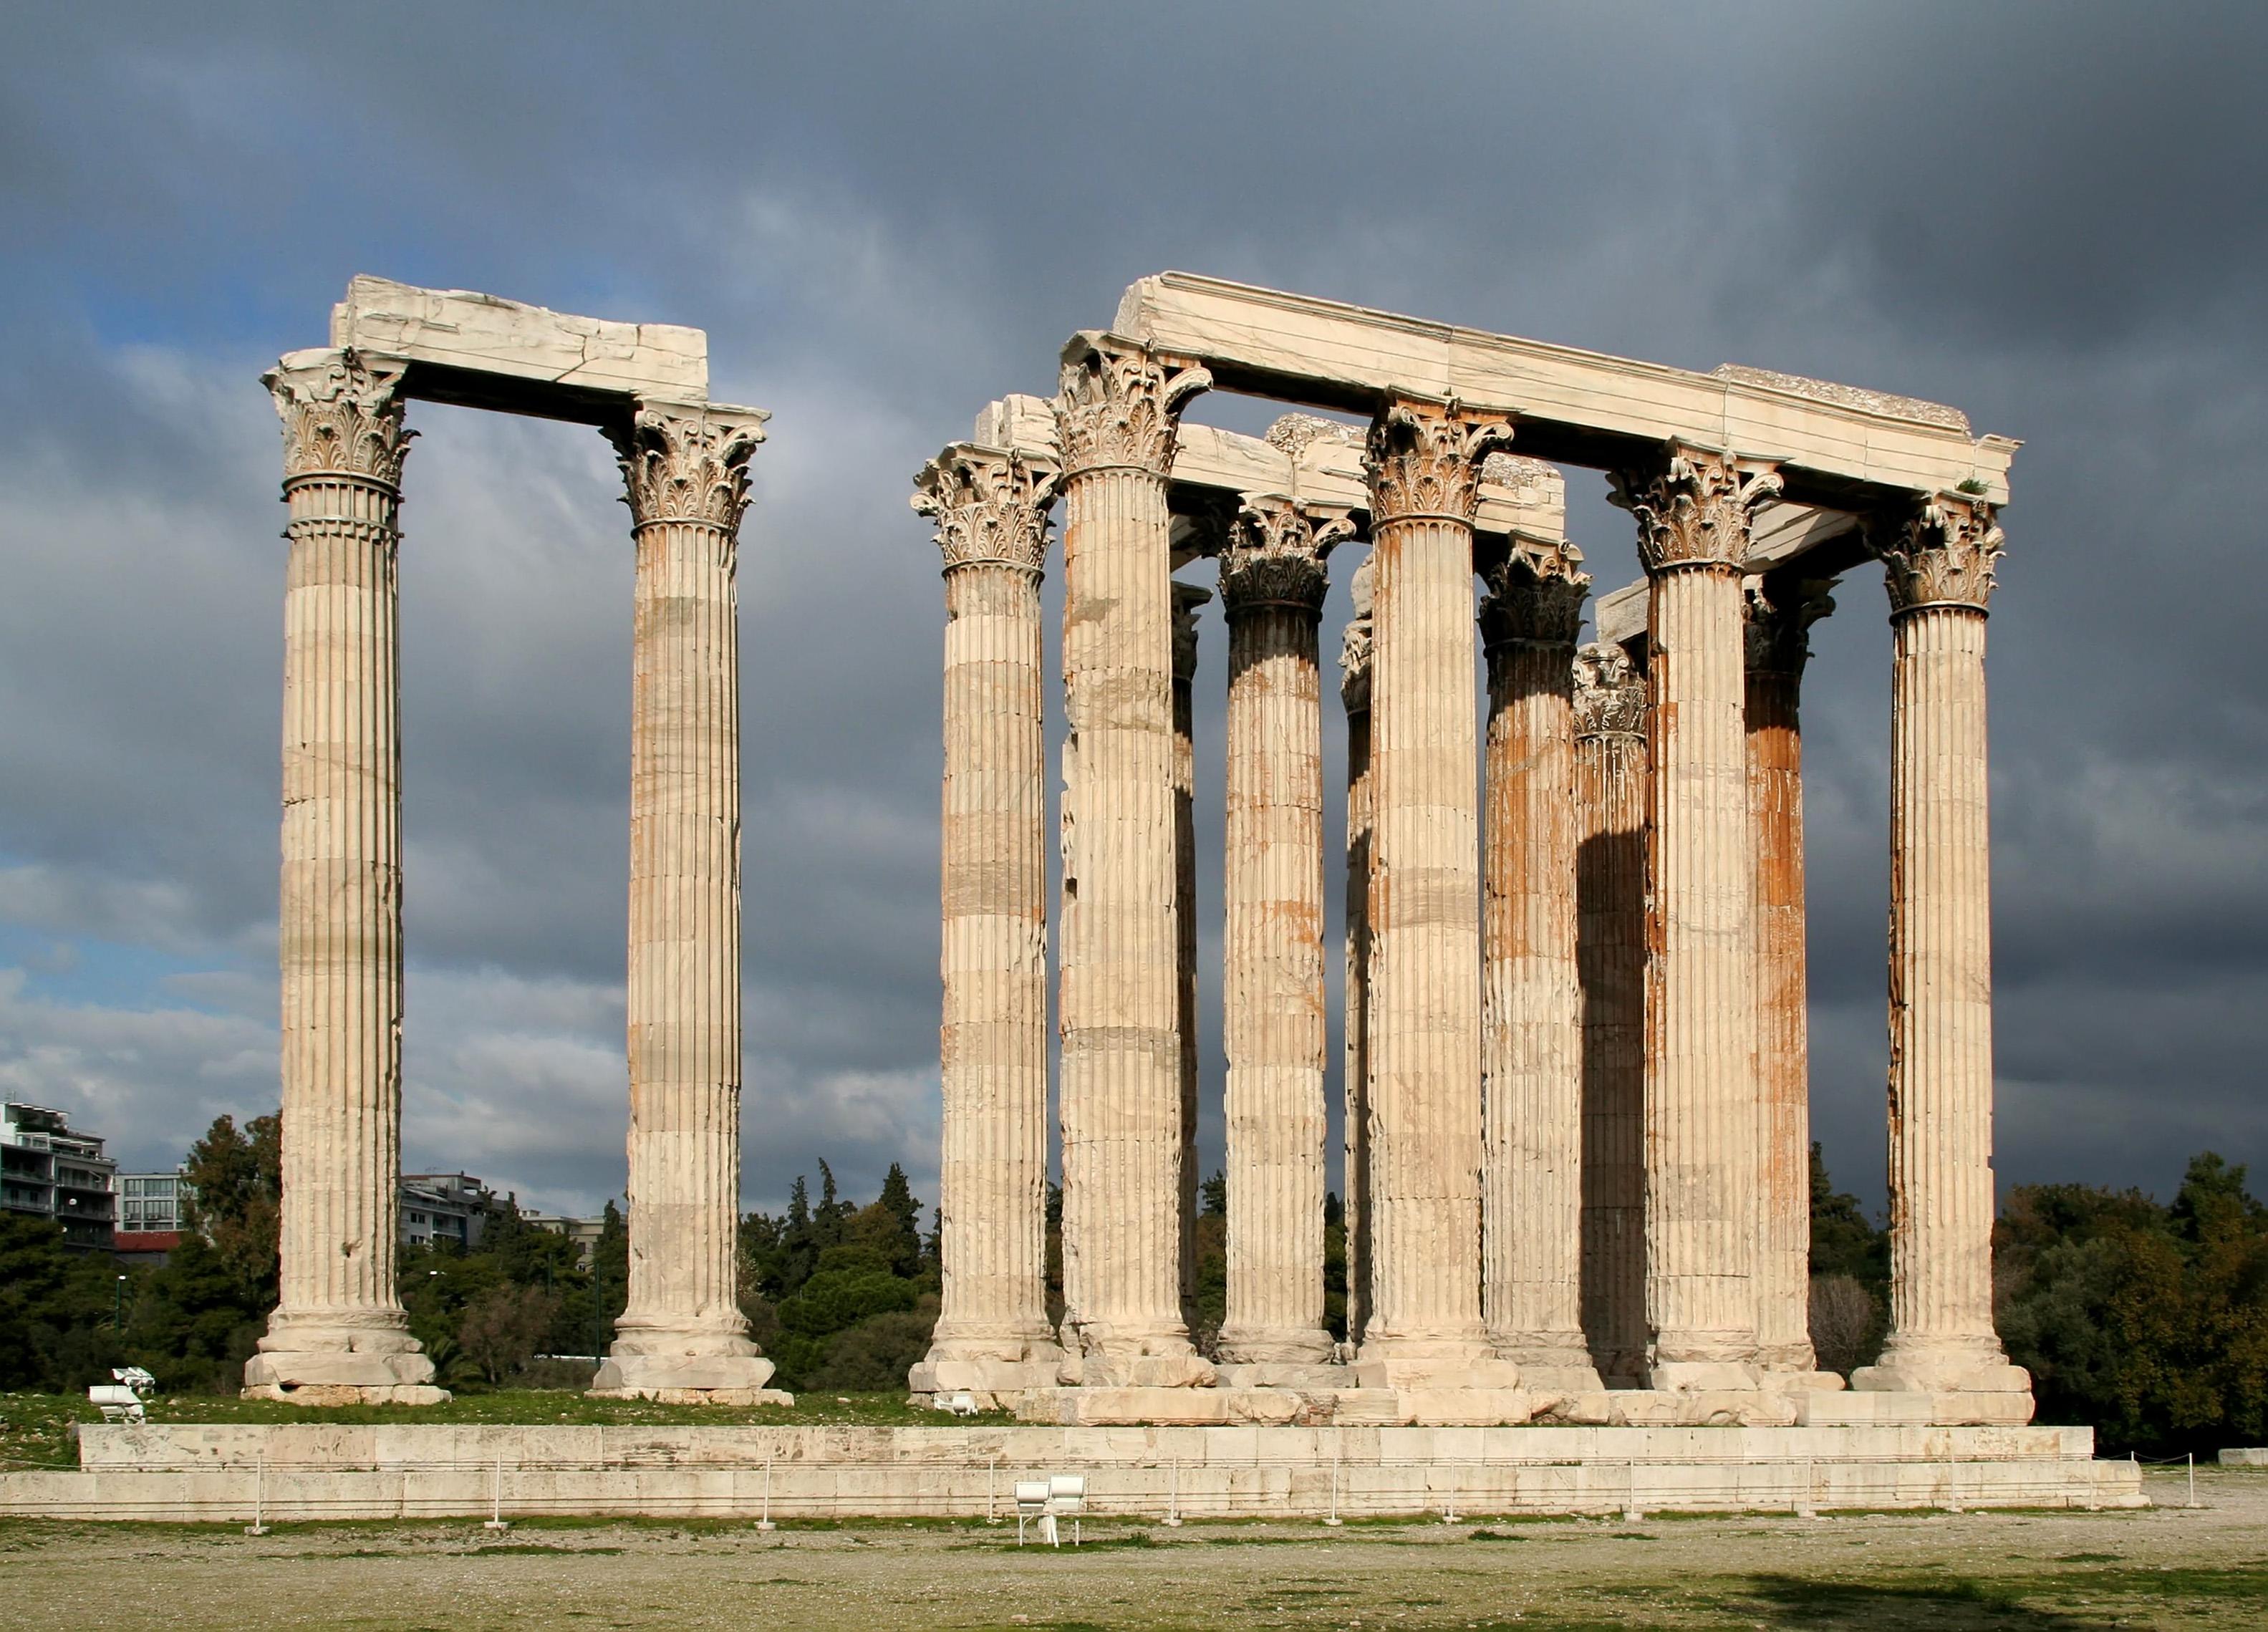 http://de.academic.ru/pictures/dewiki/84/Temple_Of_Olmpian_Zeus_retouched.jpg